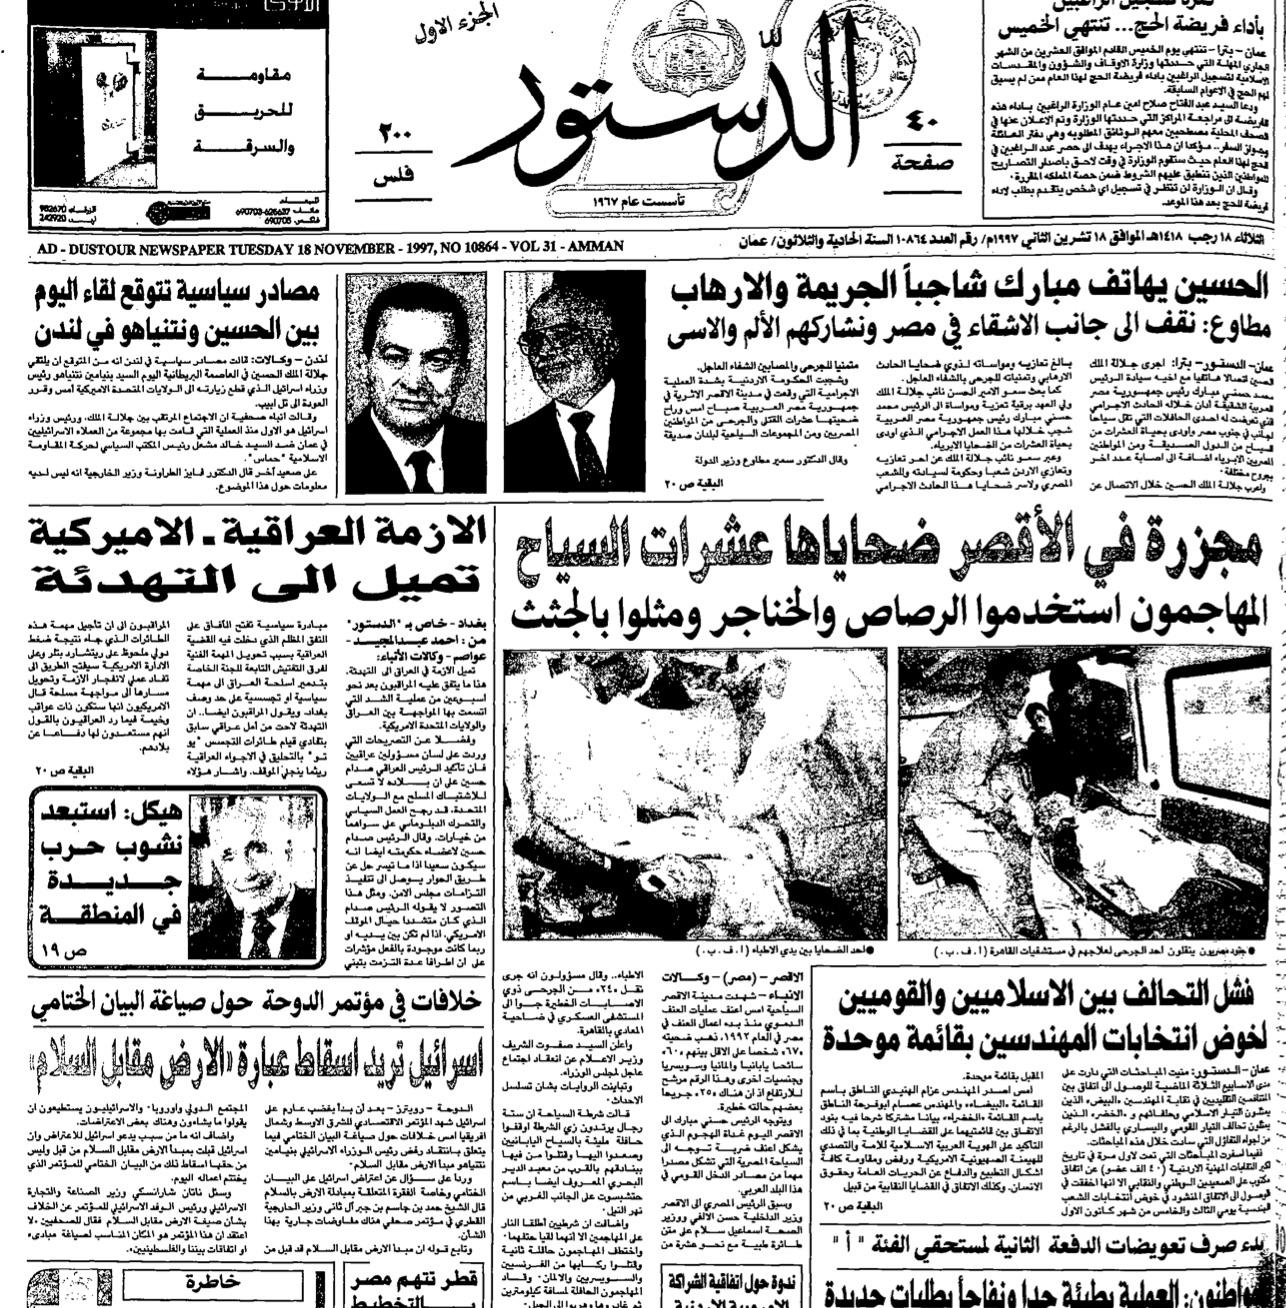 Al-Dostour, November 18, 1997